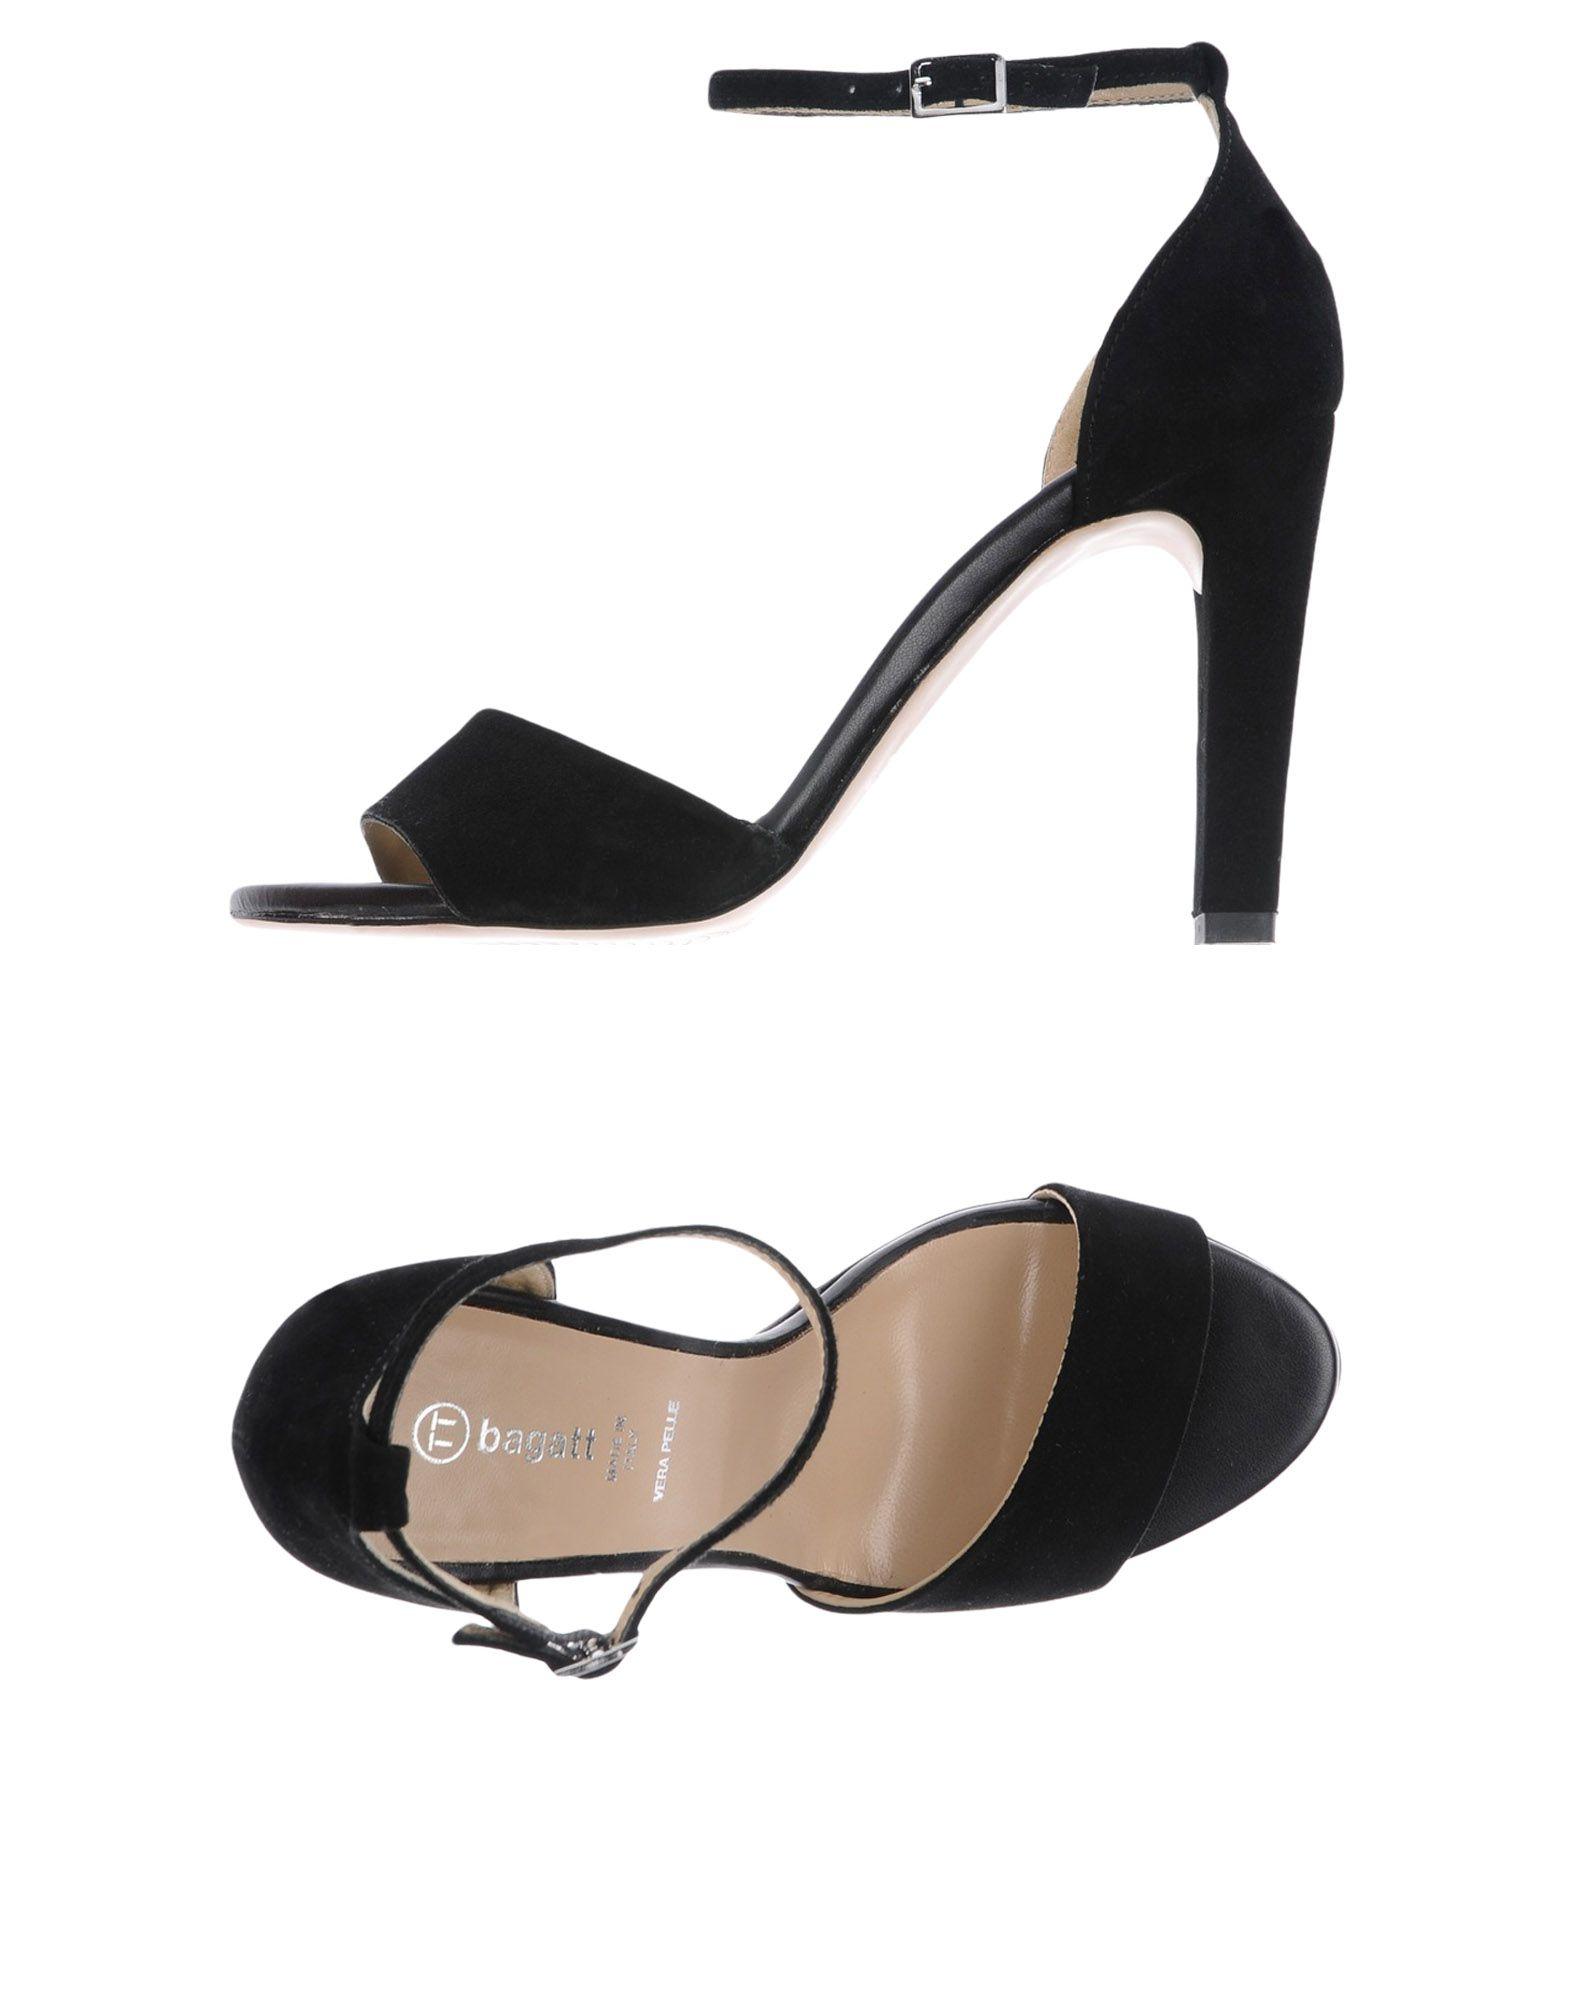 Sandales Bagatt Femme - Sandales Bagatt sur